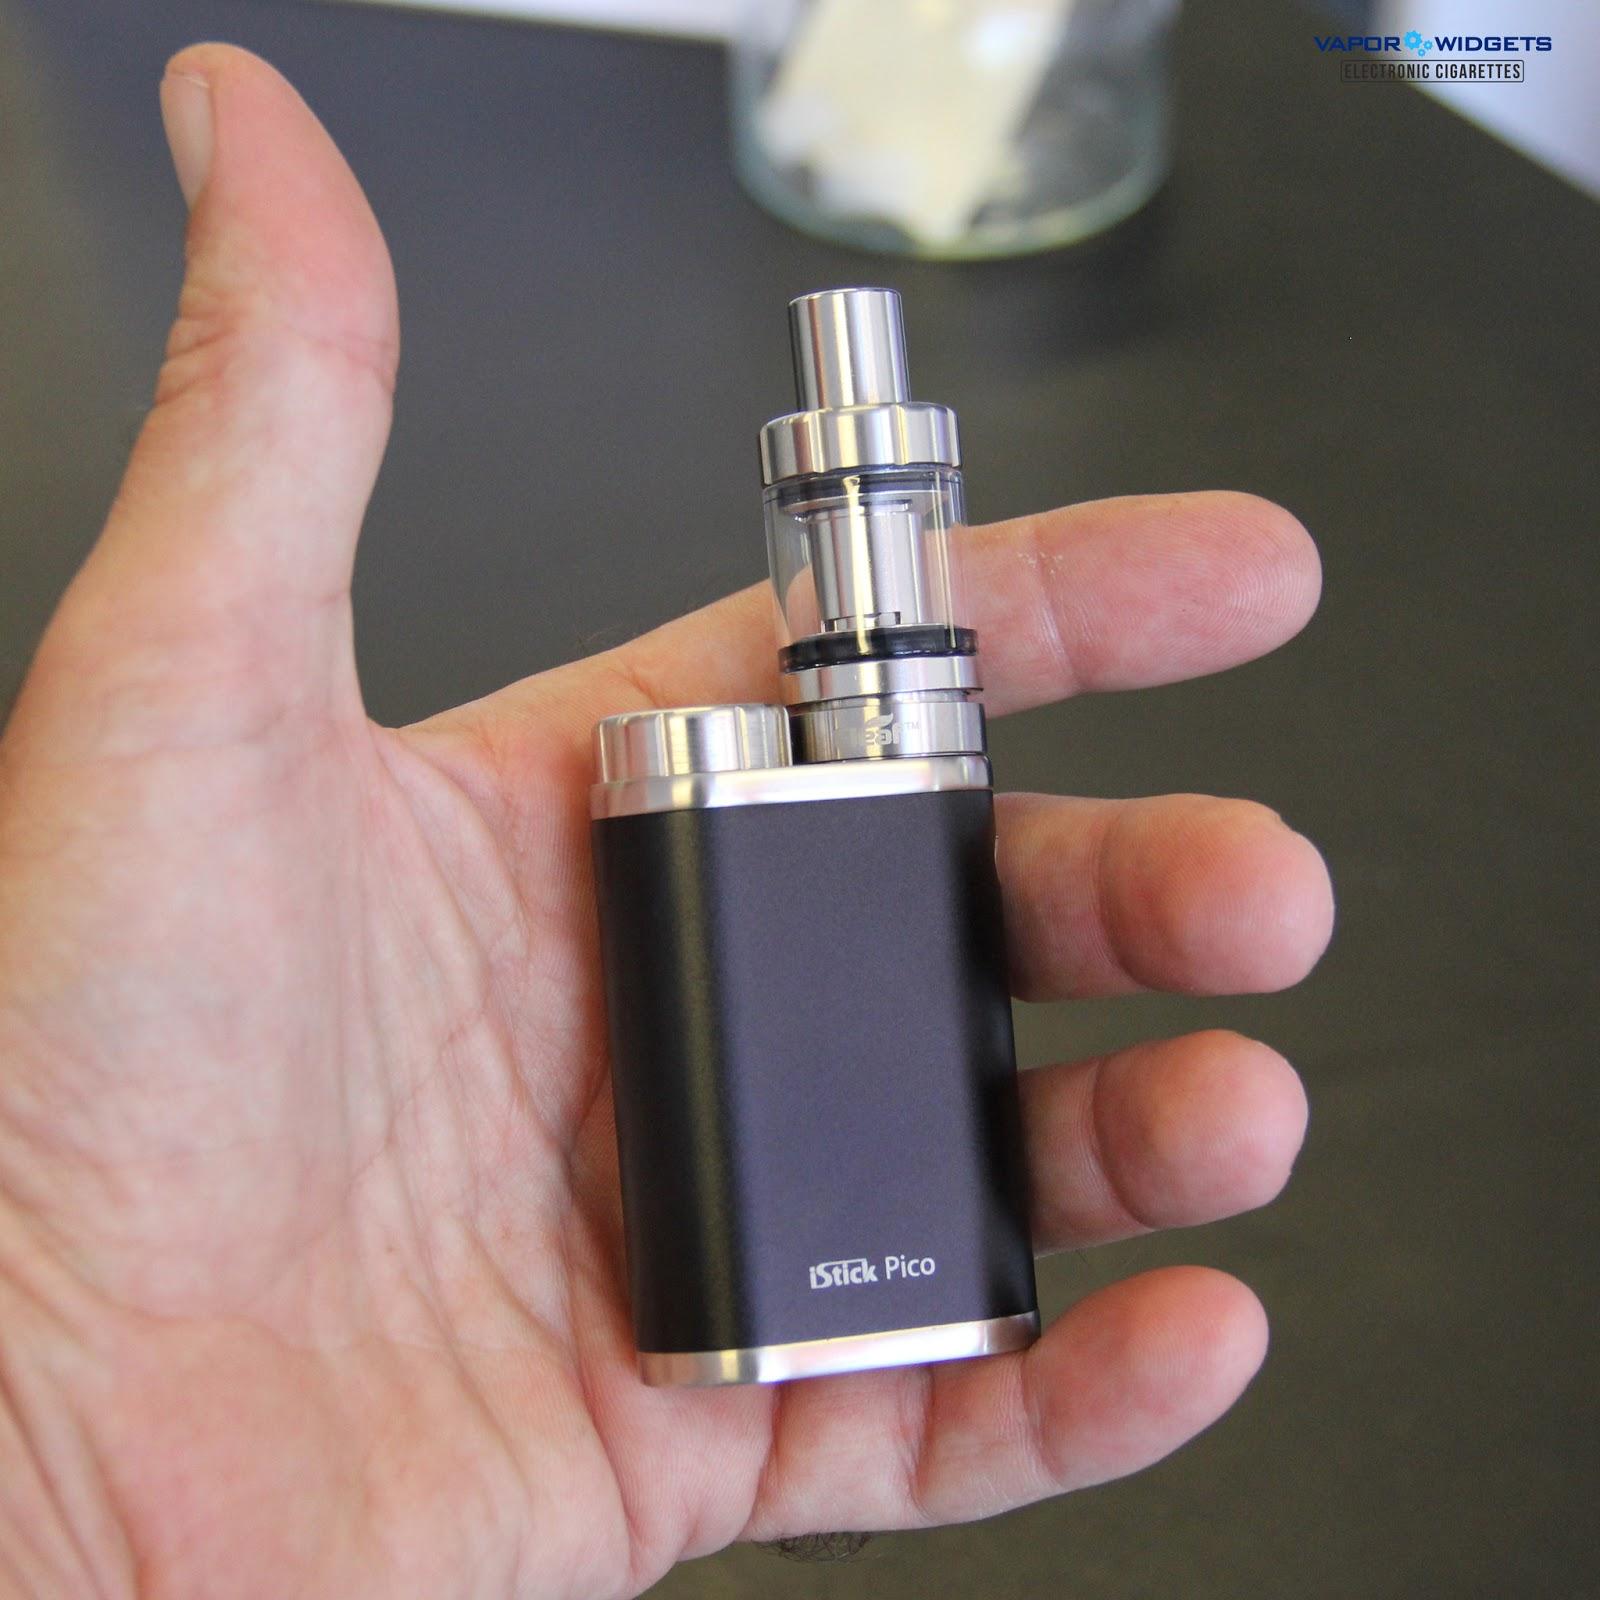 Pusat Jual Rokok Elektrik Murah | Vaporizer Grosir ...